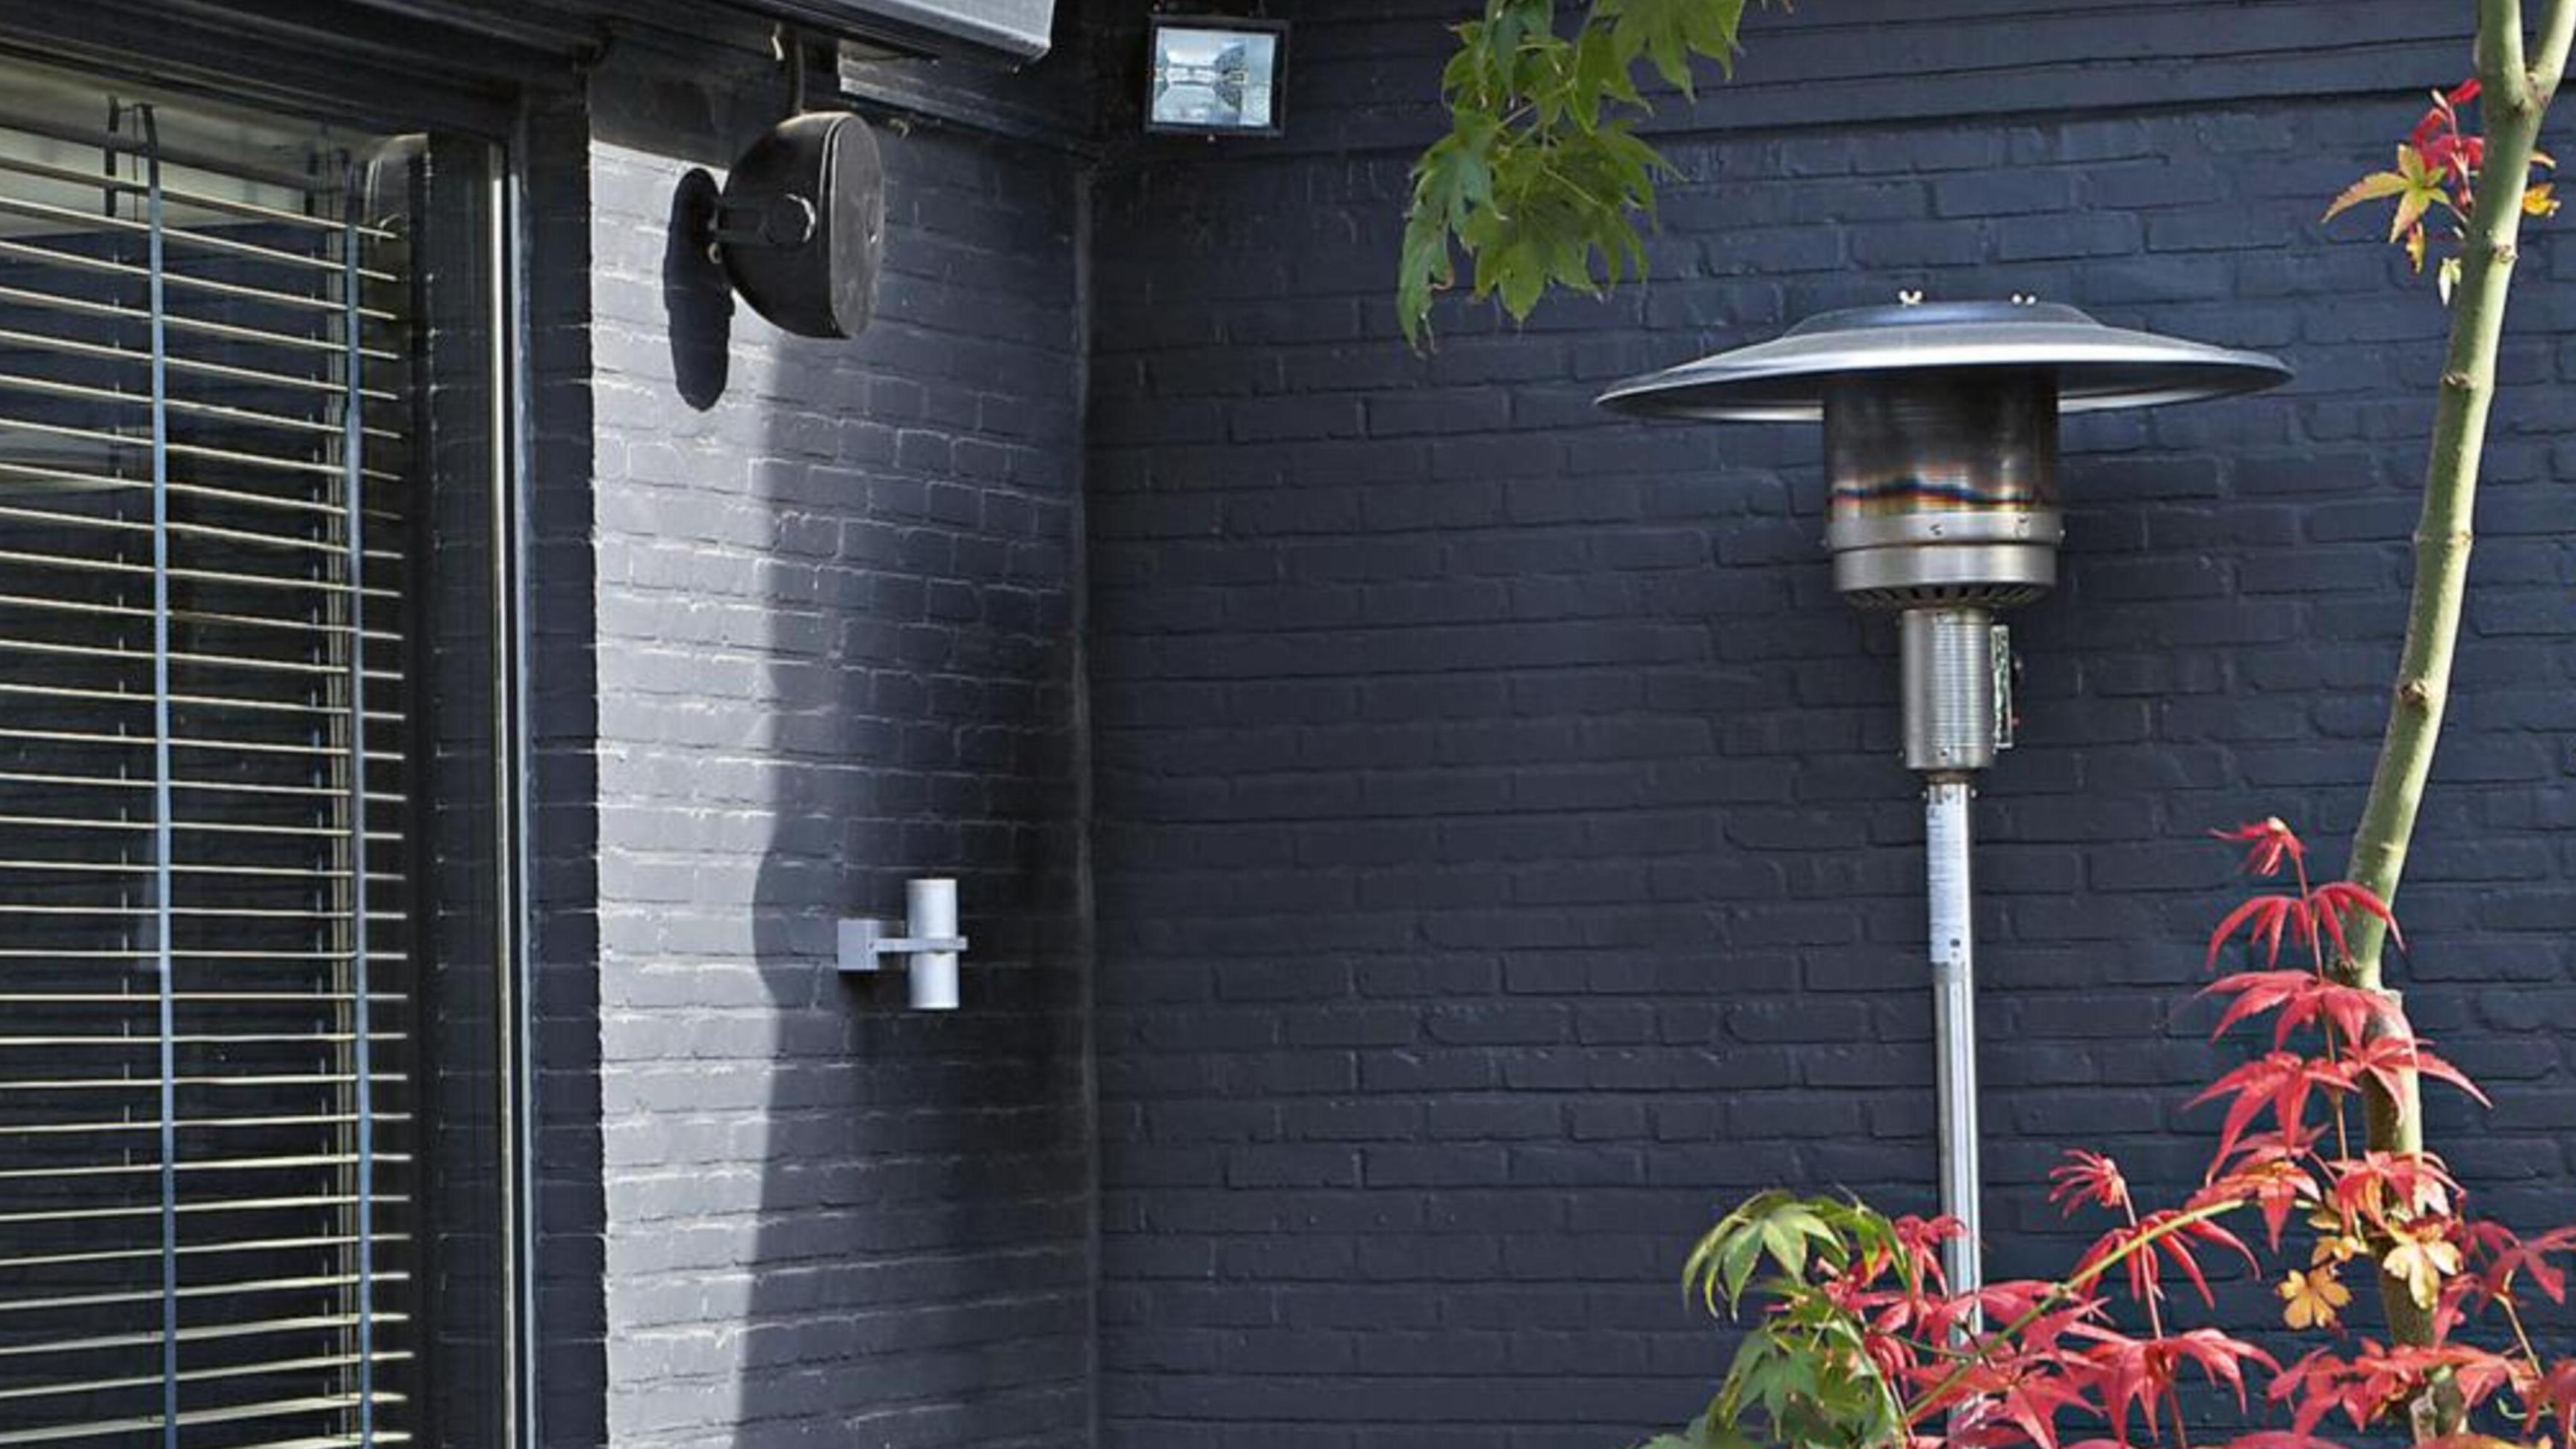 The Fiammetta outdoor gas patio heater outside a dark grey house.